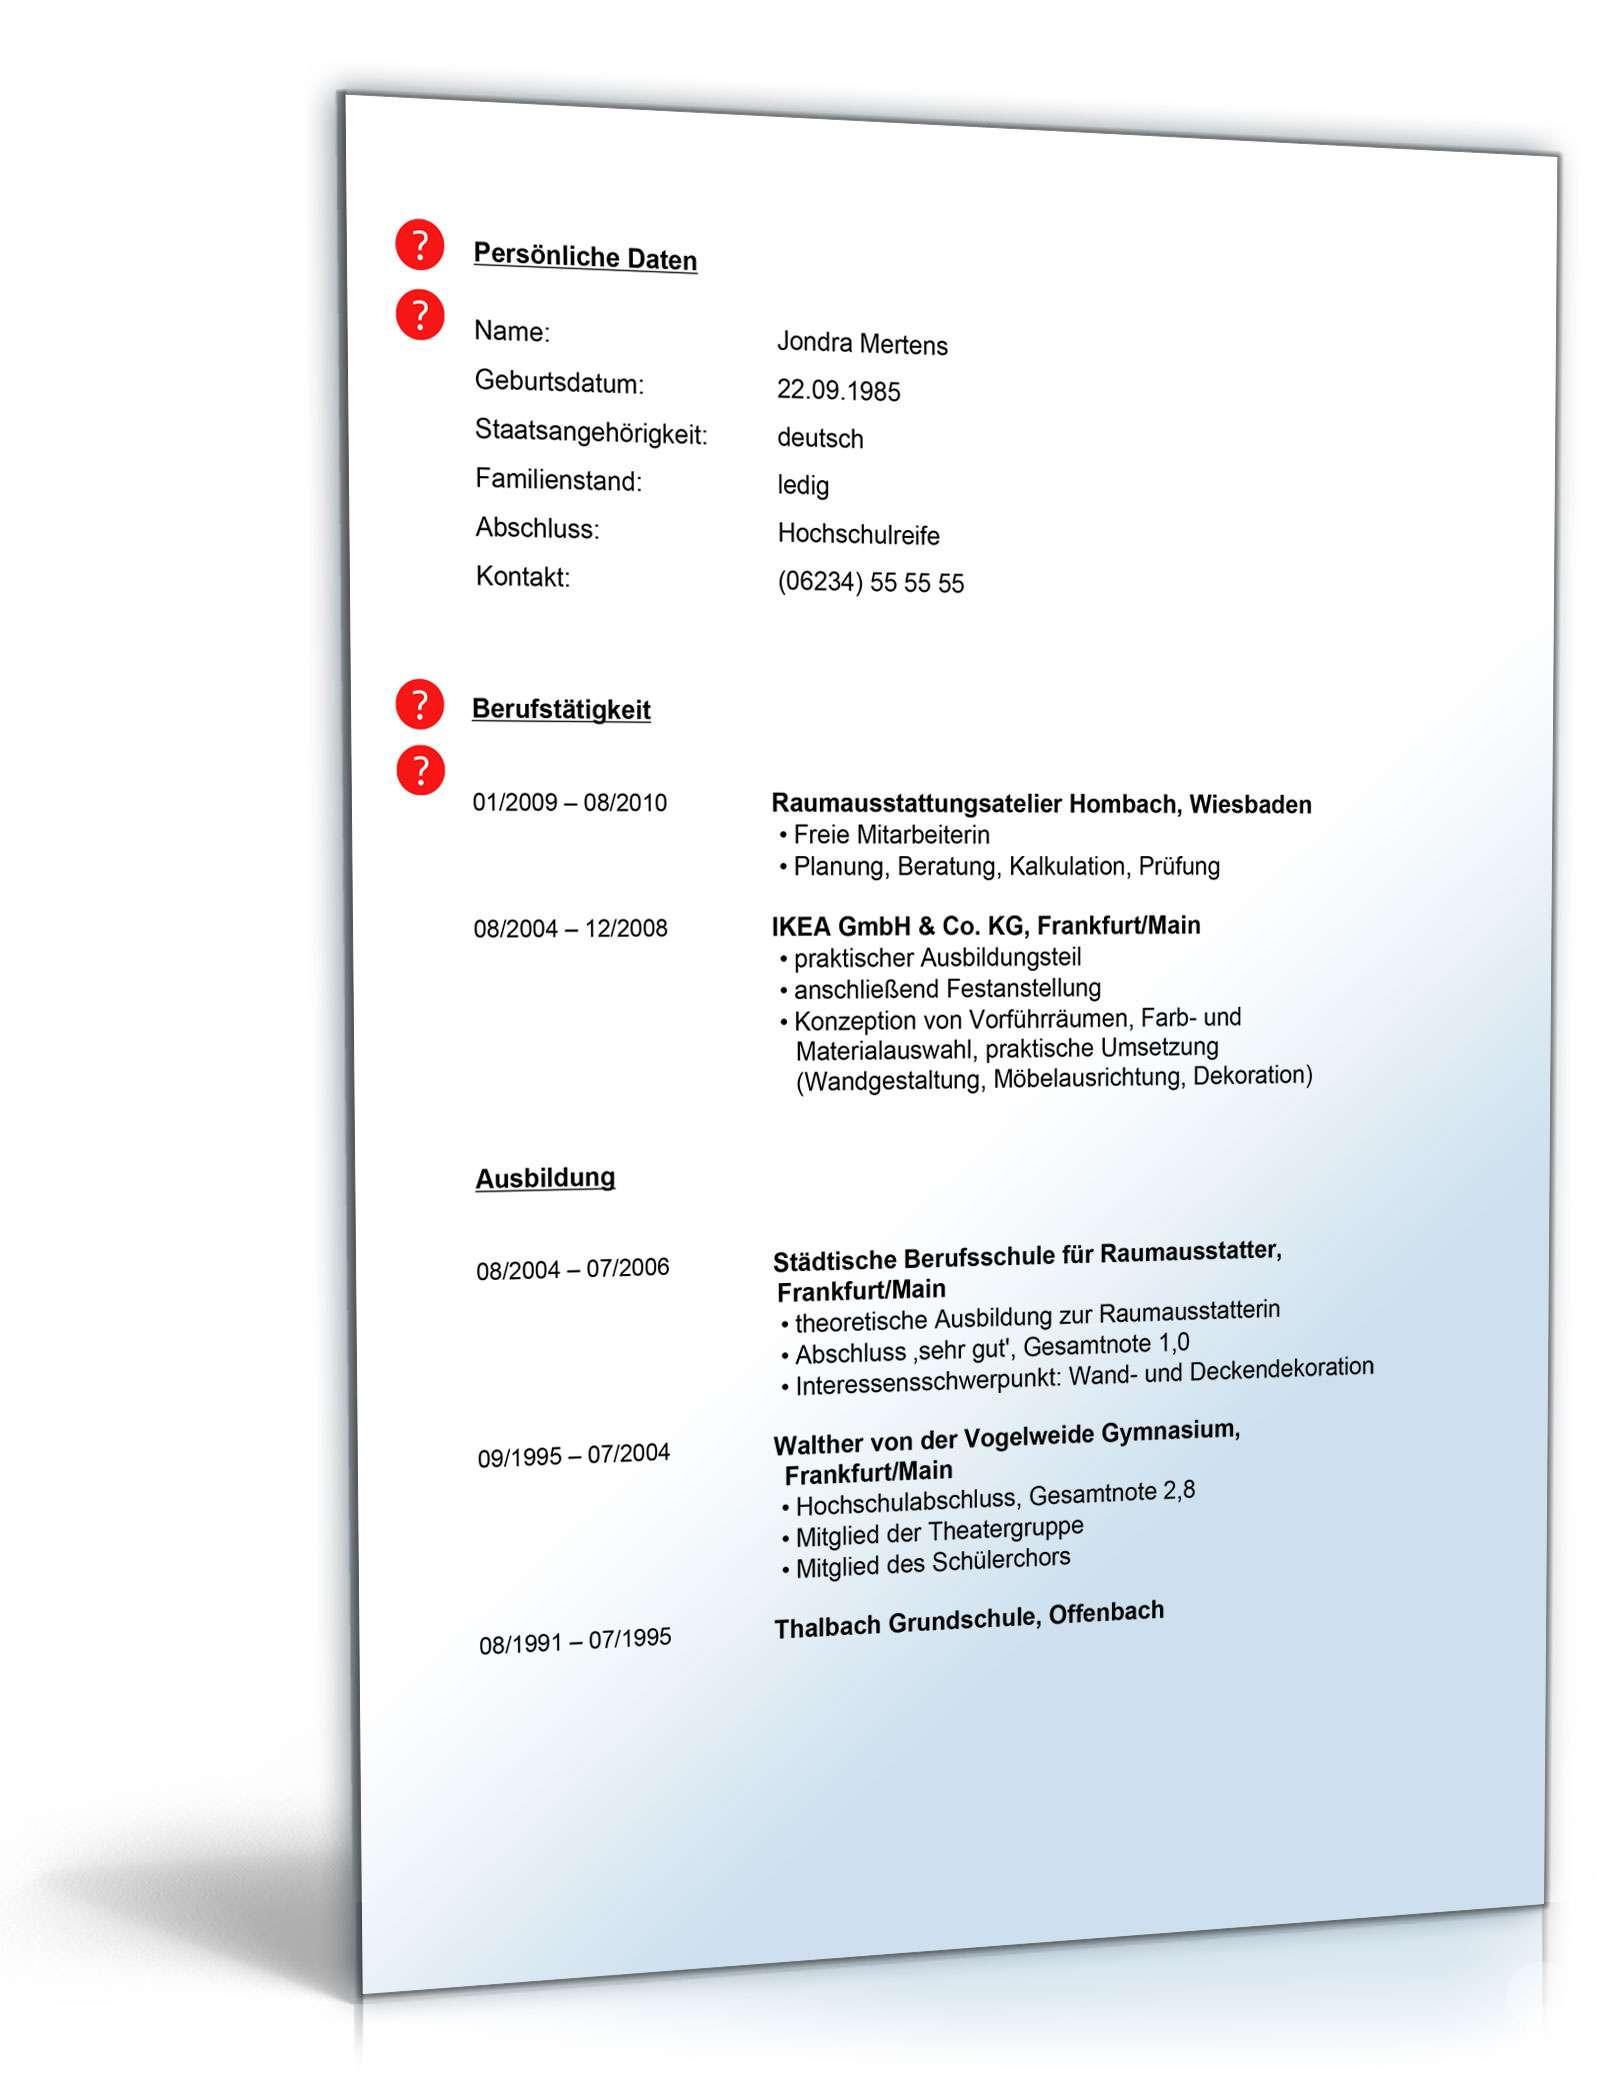 Lebenslauf raumausstatter muster zum download for Raumausstatter beruf